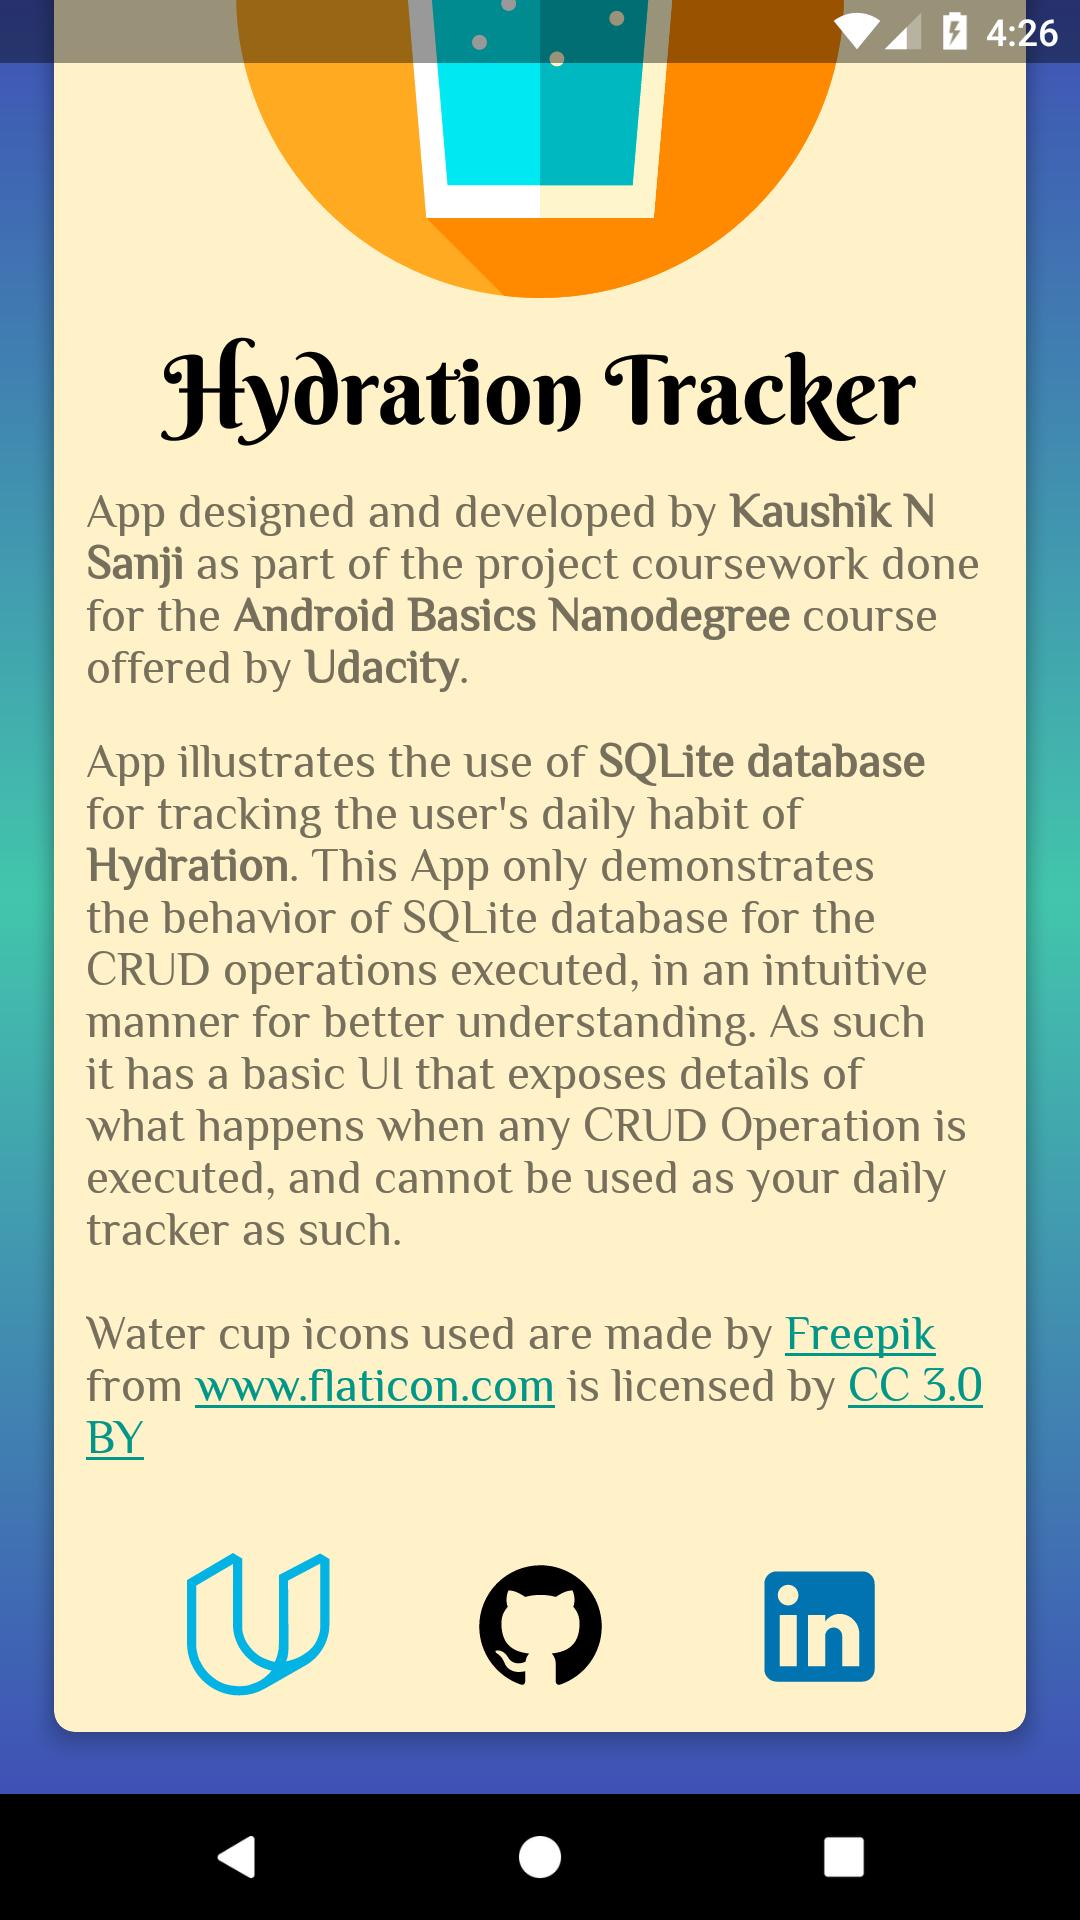 GitHub - kaushiknsanji/HydrationTracker_Demo_App: App illustrating